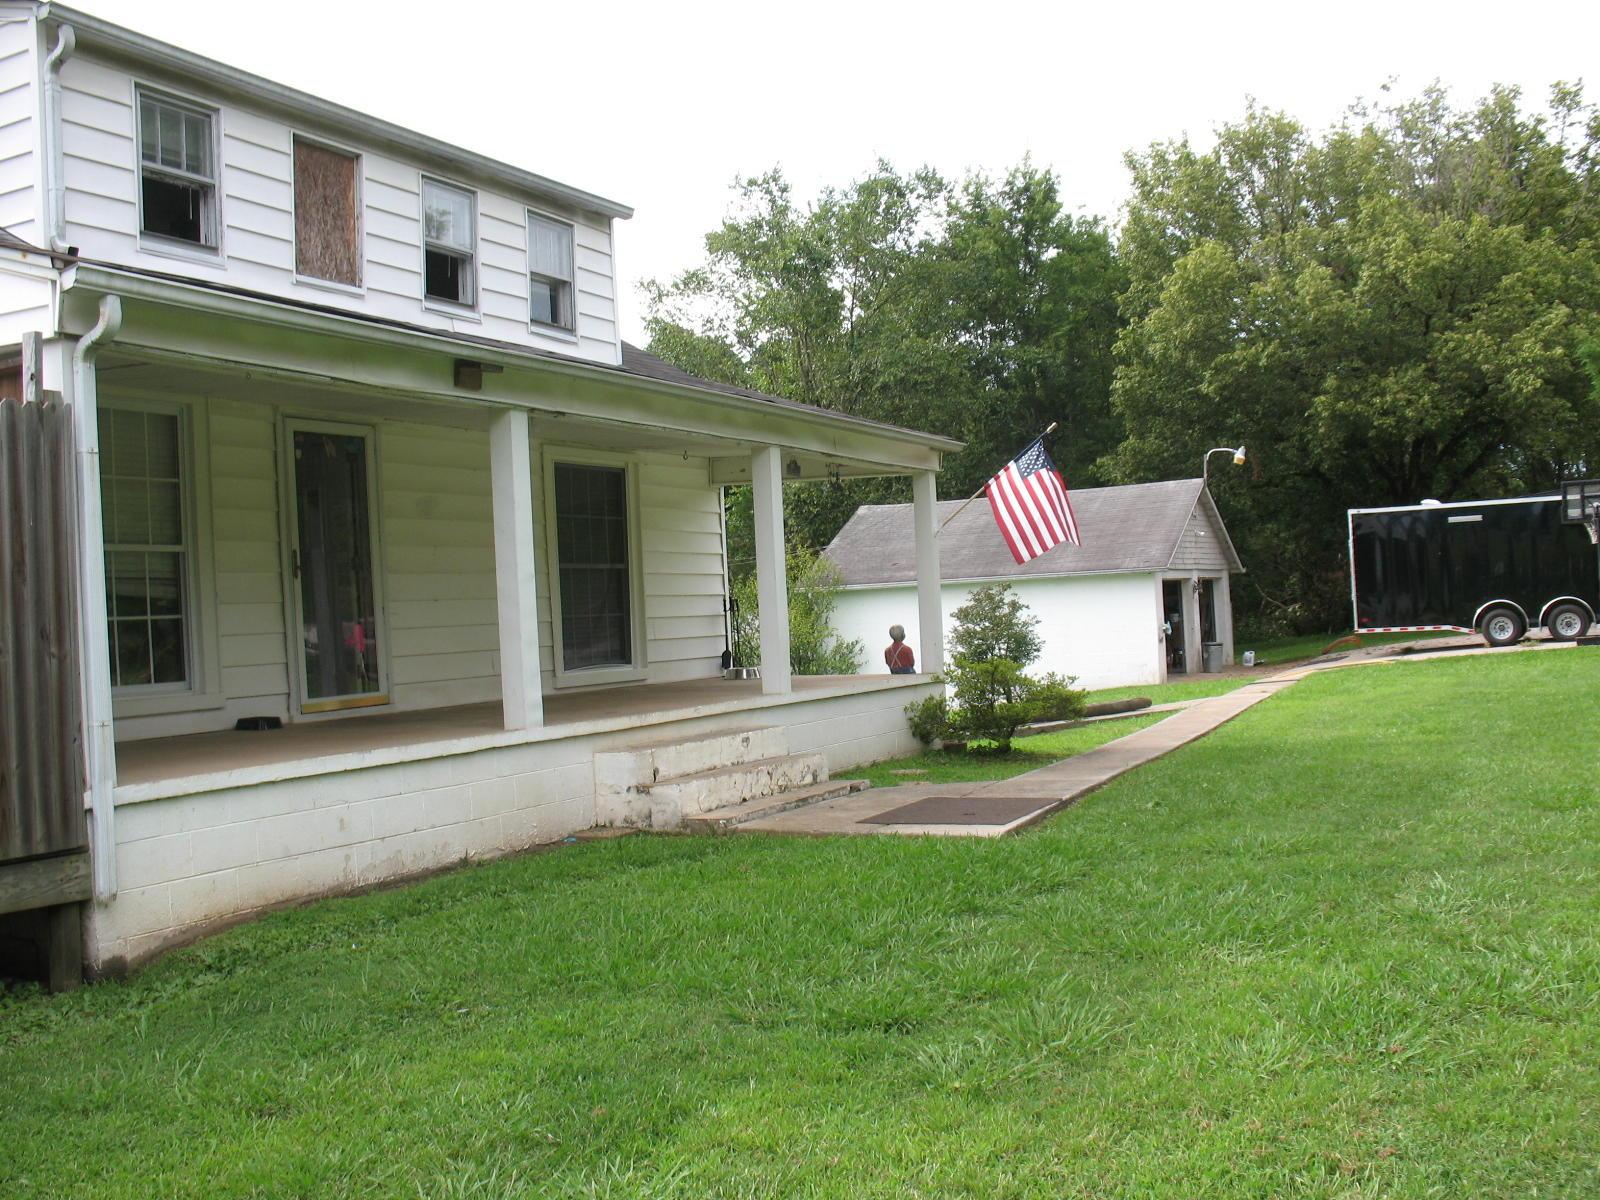 7905 Maynardville Pike Hwy, Knoxville, TN 37938